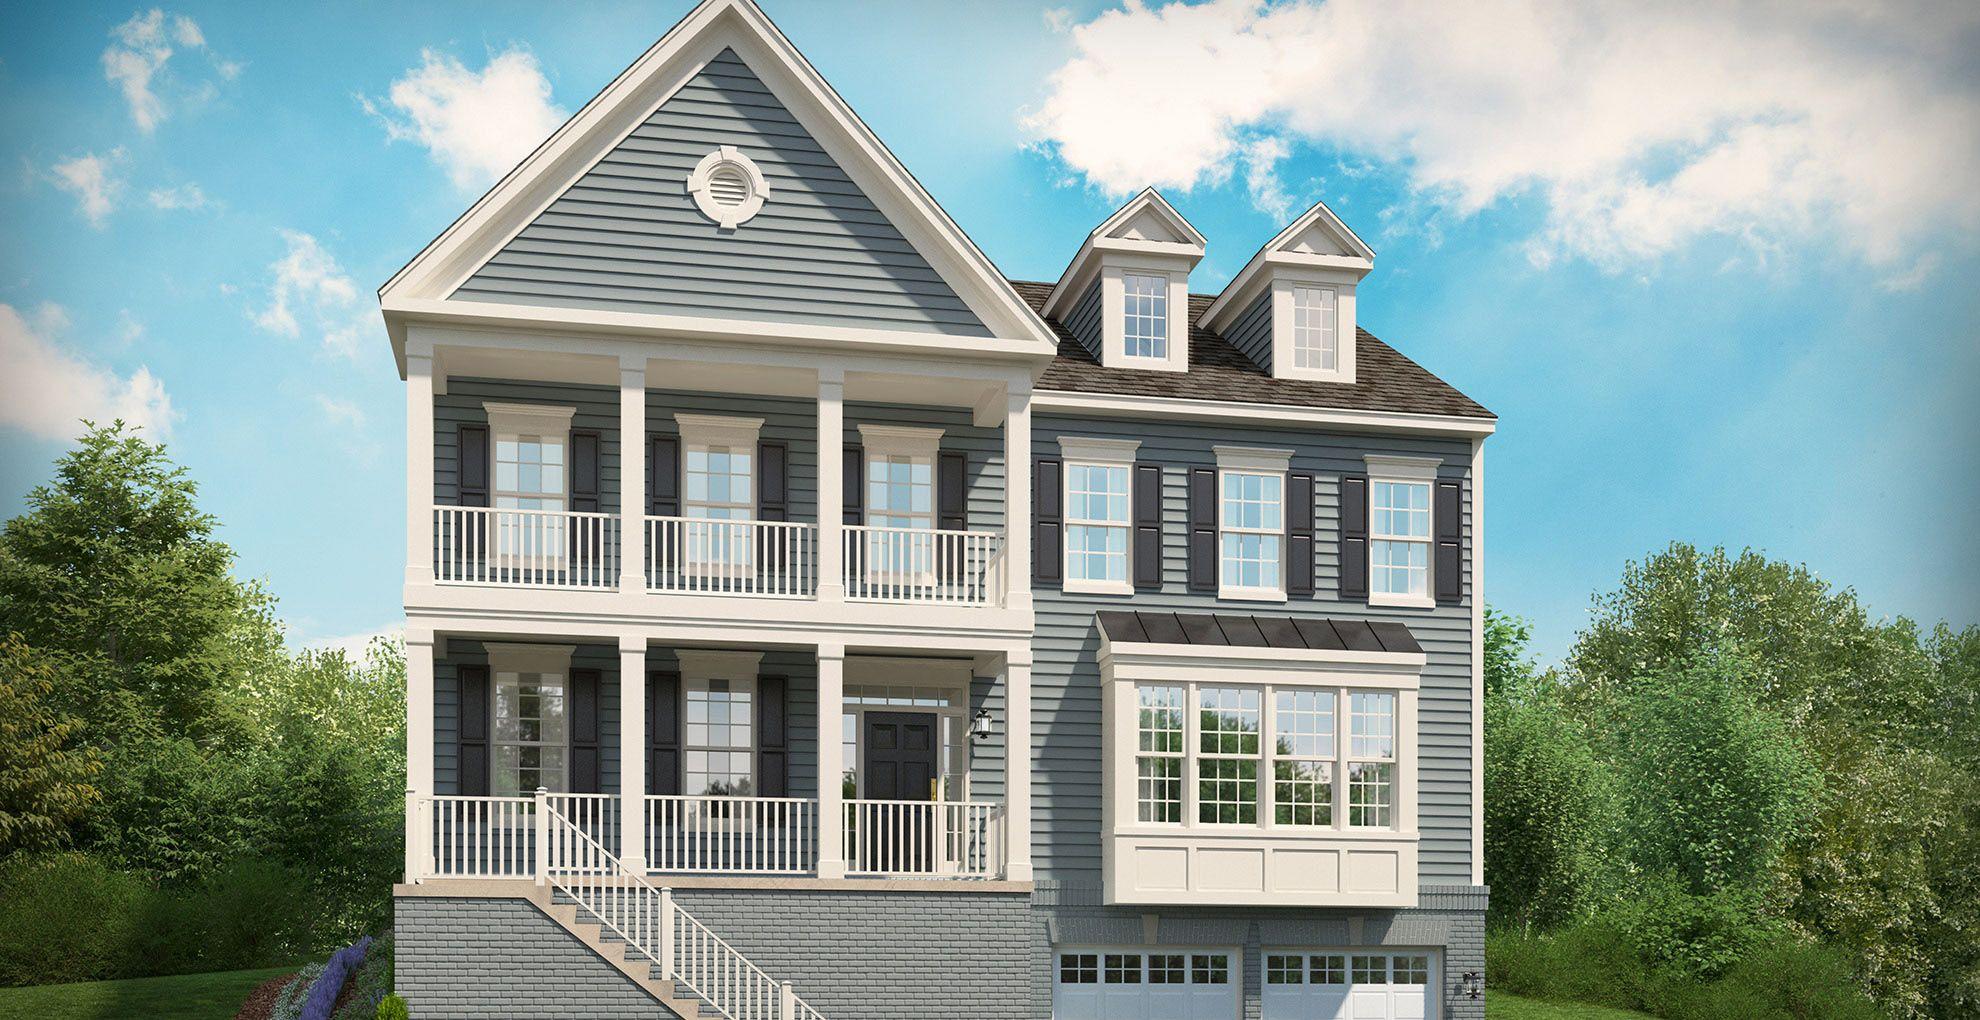 Stanley martin homes windsor hill the kearney 1363393 for Modern homes for sale in virginia